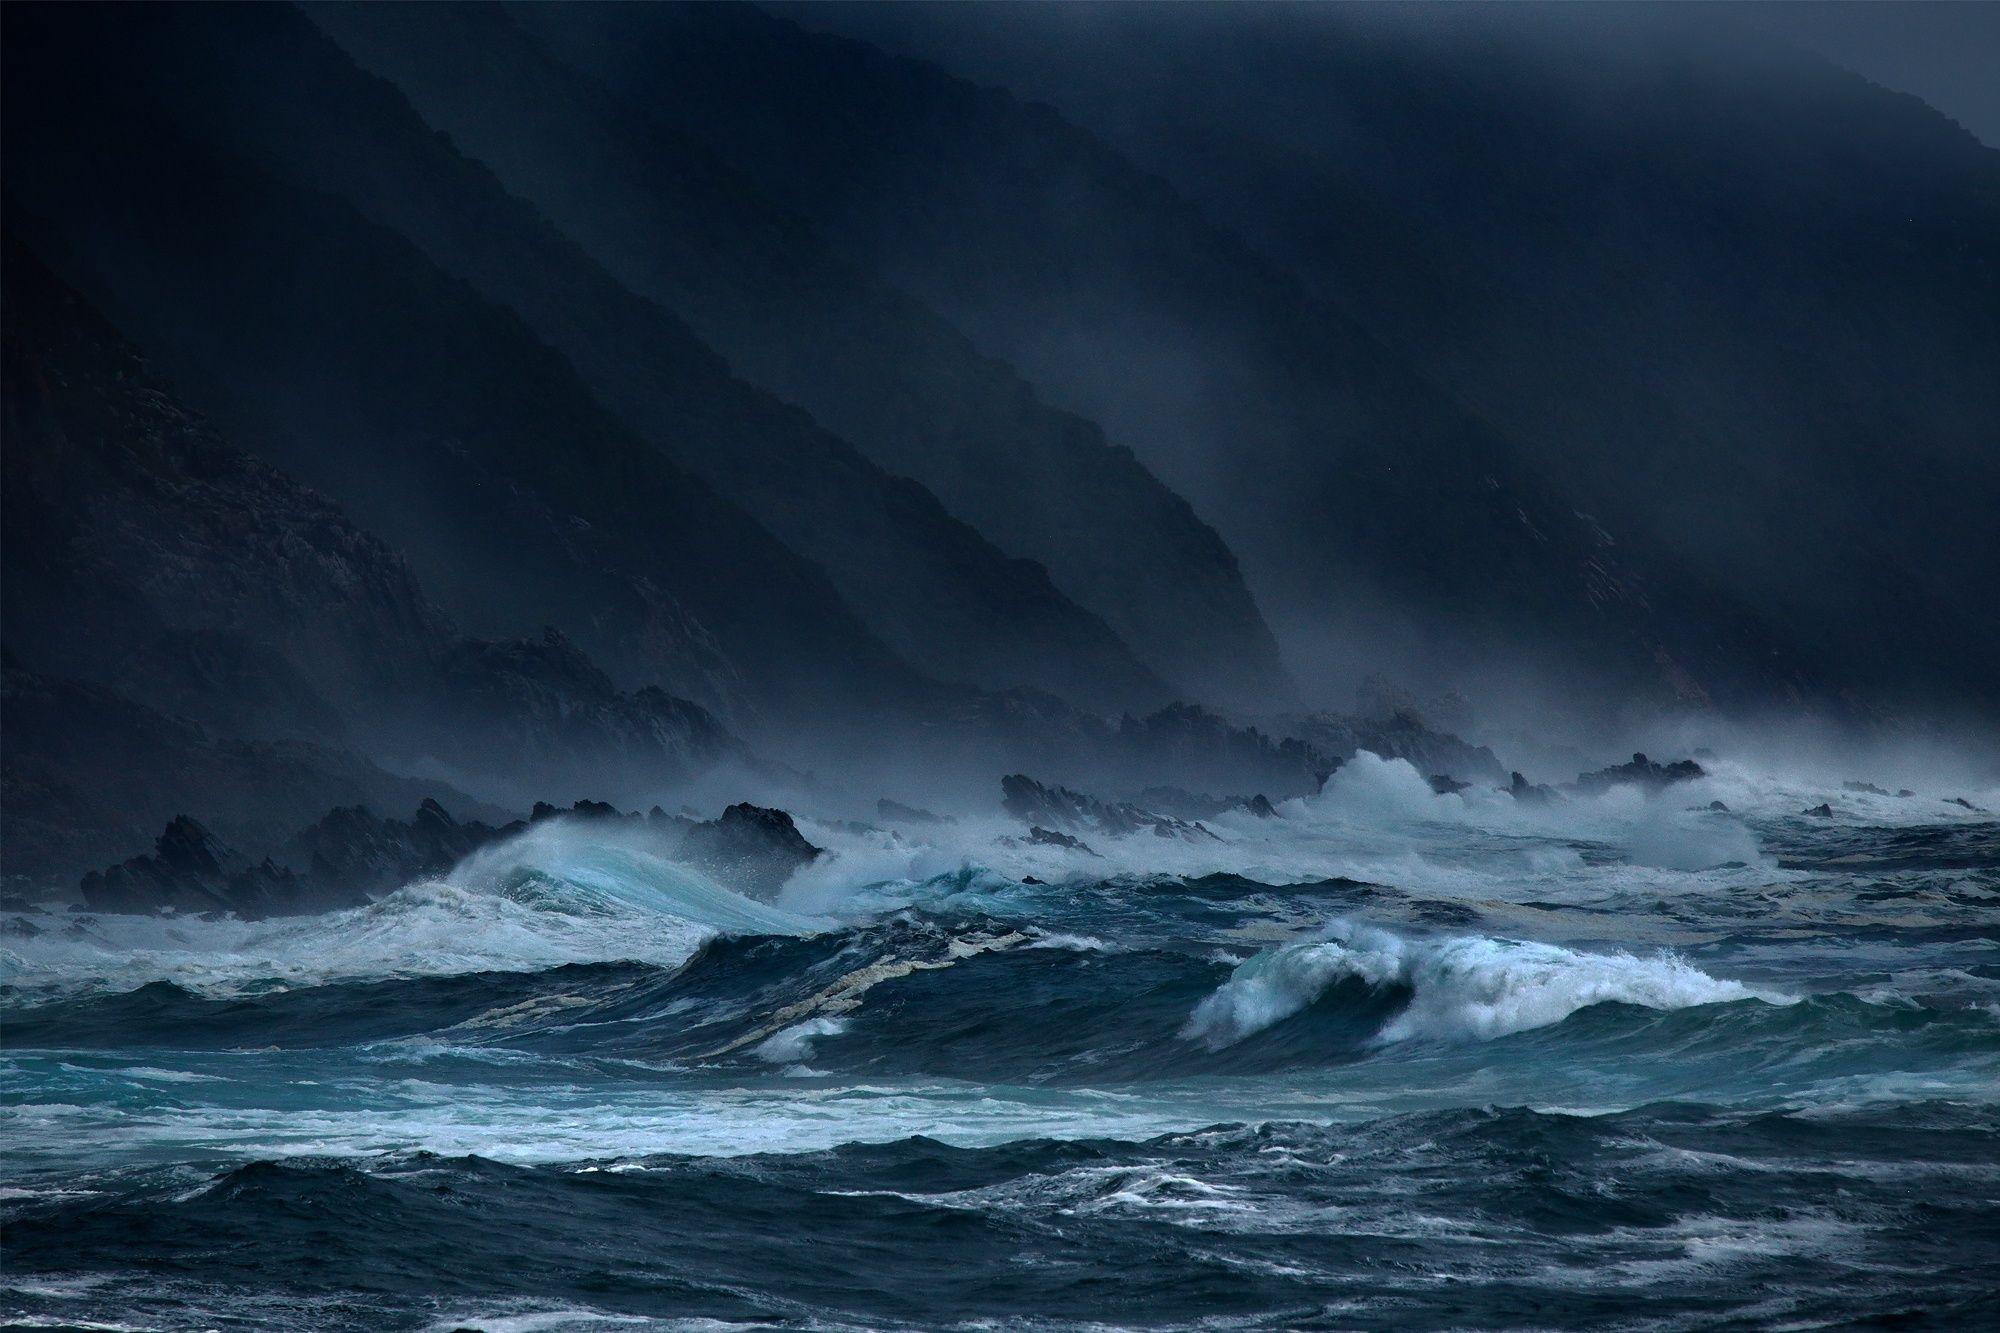 Ocean Storm Wallpapers Wallpaper Cave